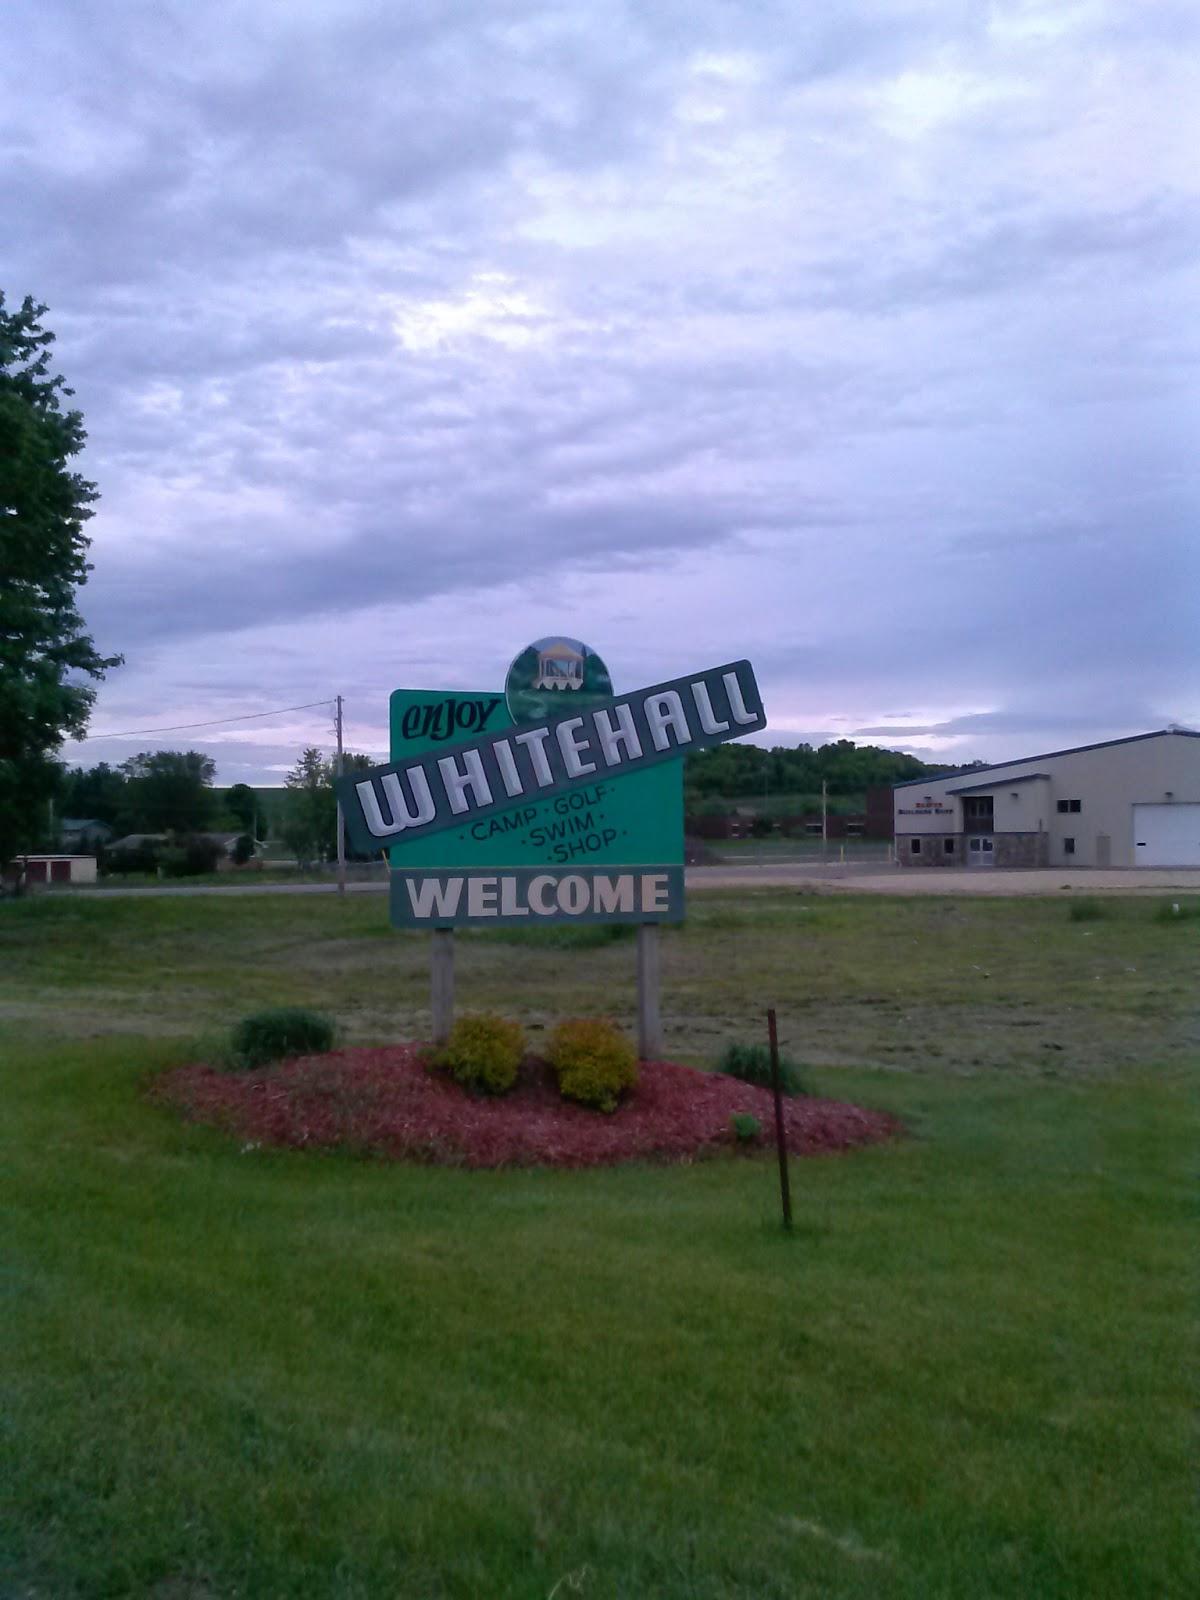 Crazy Travel Adventures: Whitehall, Wisconsin: Adventures of a City ...